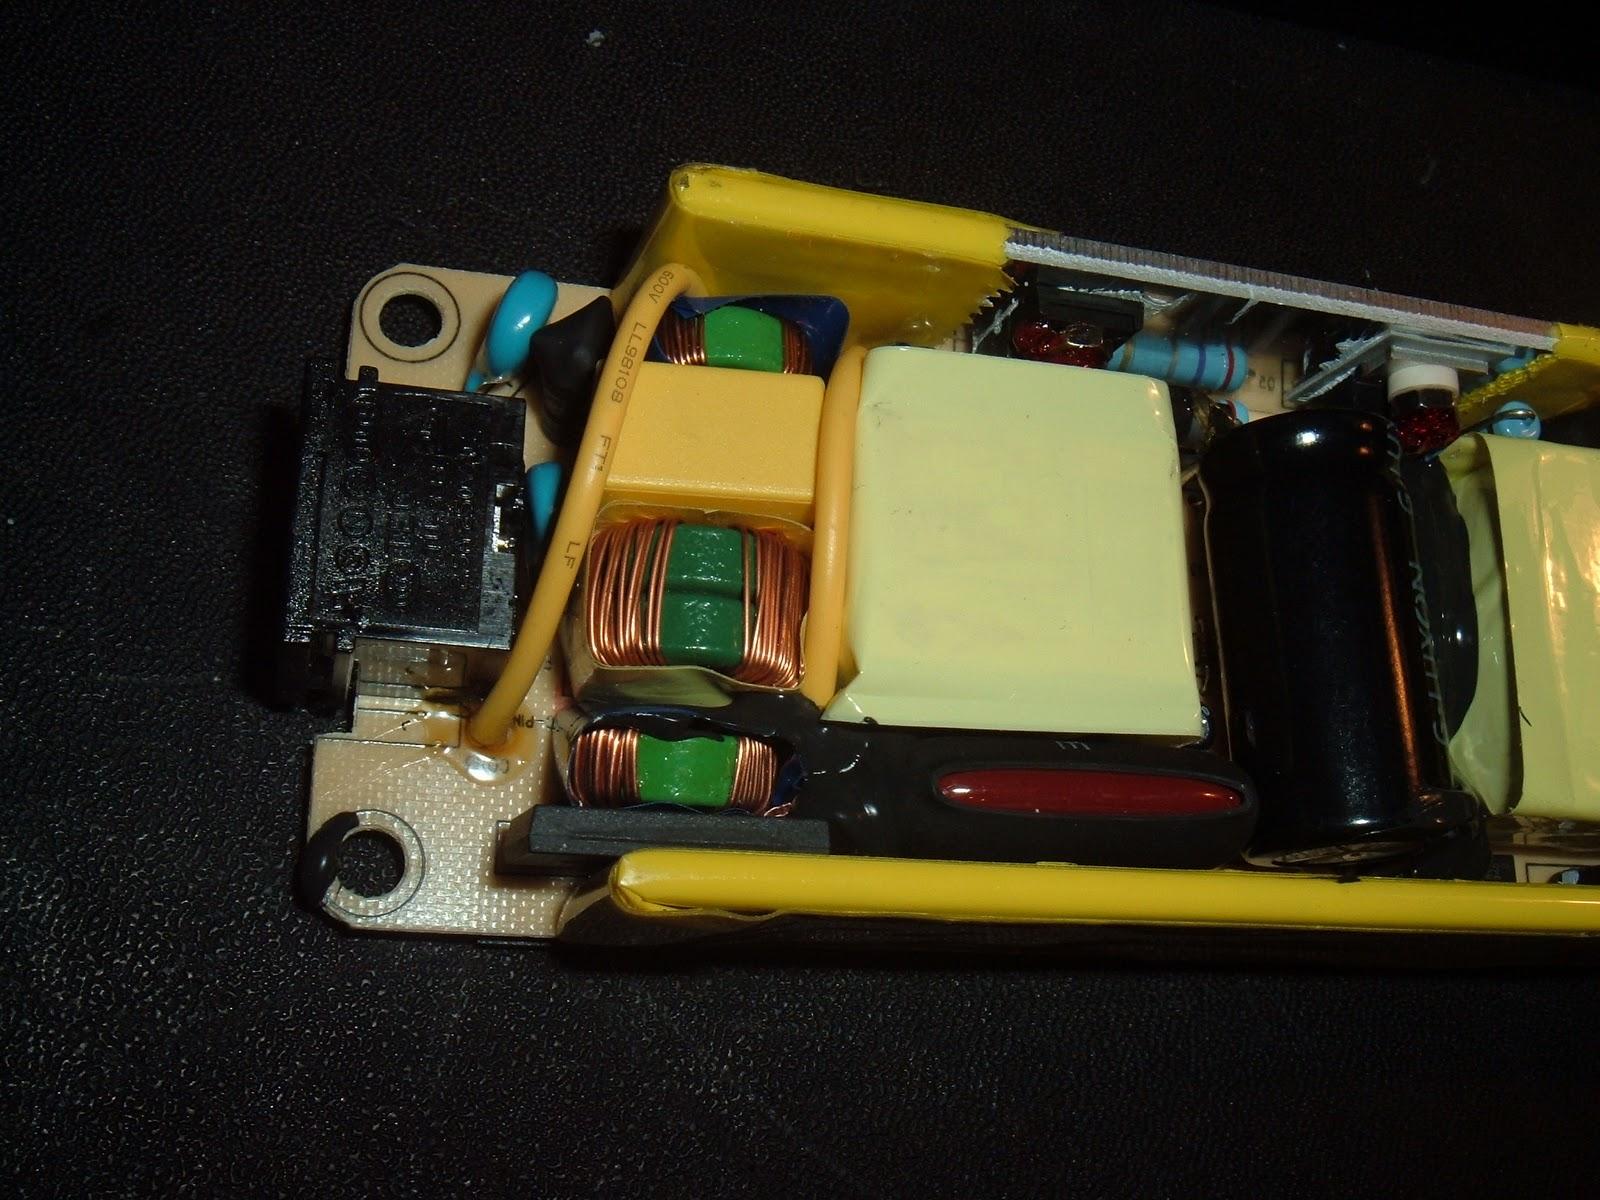 Dell Laptop Power Adapter Schematic Manual Of Wiring Diagram Supply Tynemouth Software Universal Teardown Rh Blog Tynemouthsoftware Co Uk Circuit Pinout